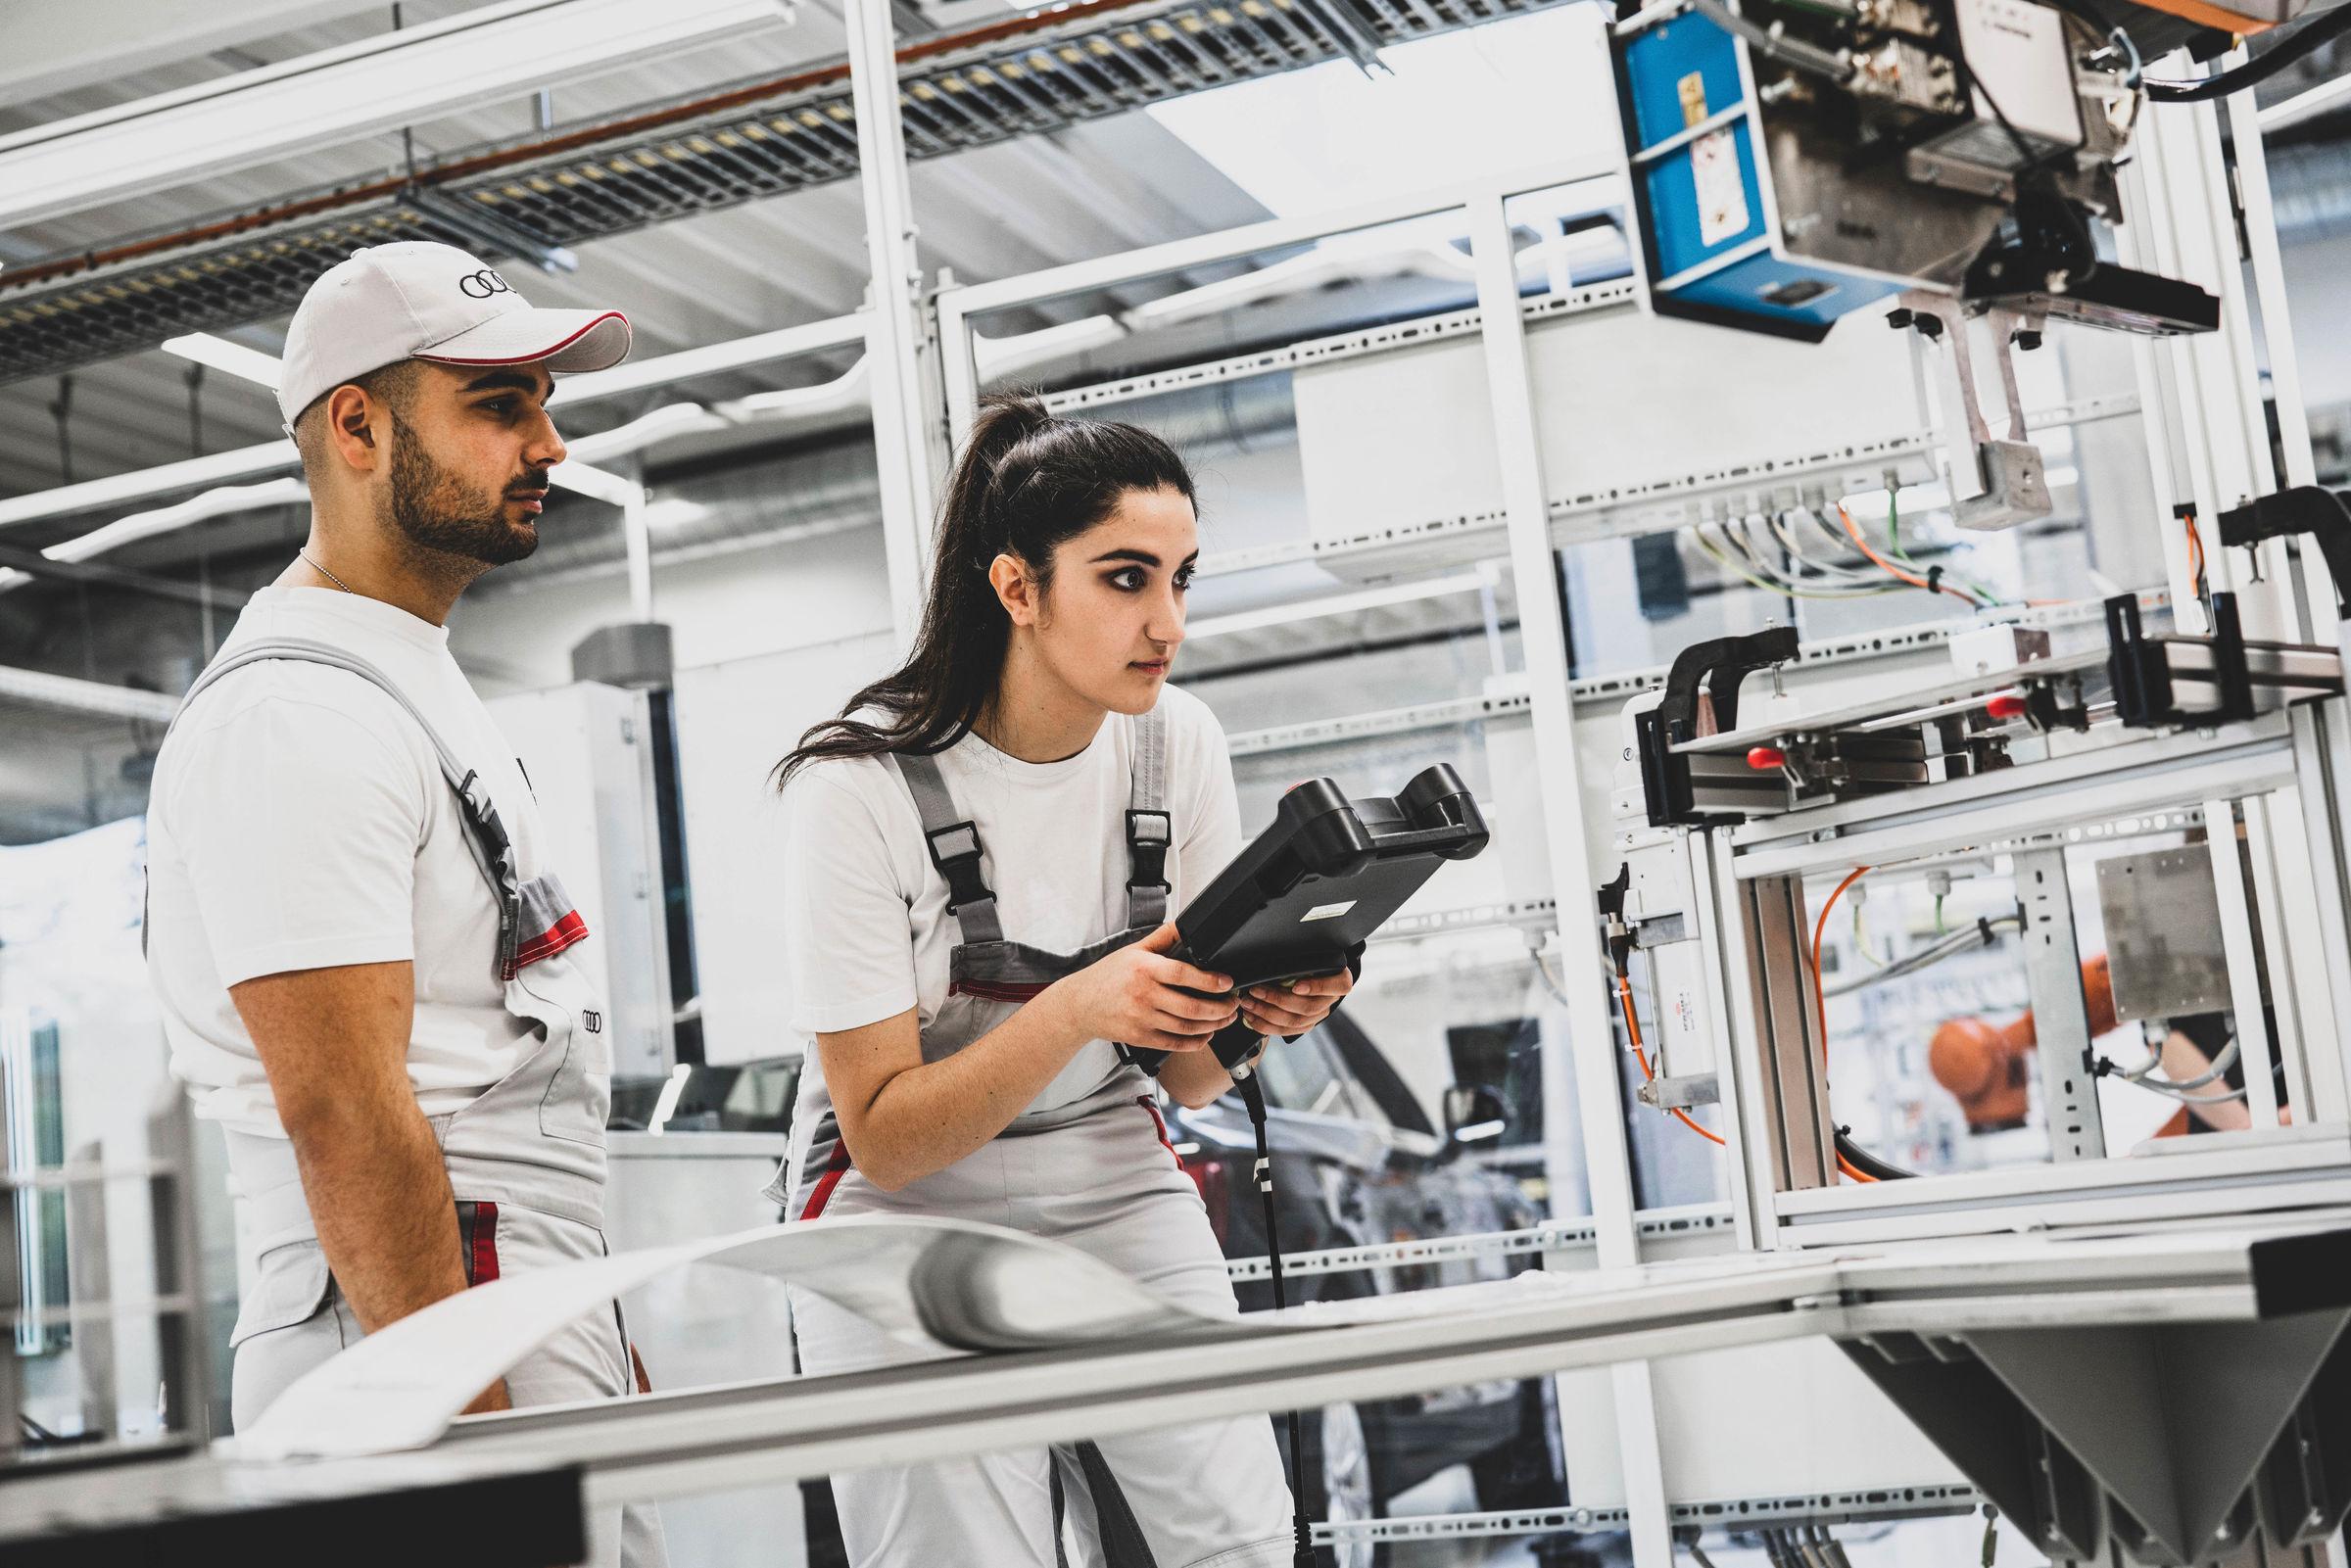 Stream & Chat: Digital information weeks for apprenticeships at Audi - Image 2